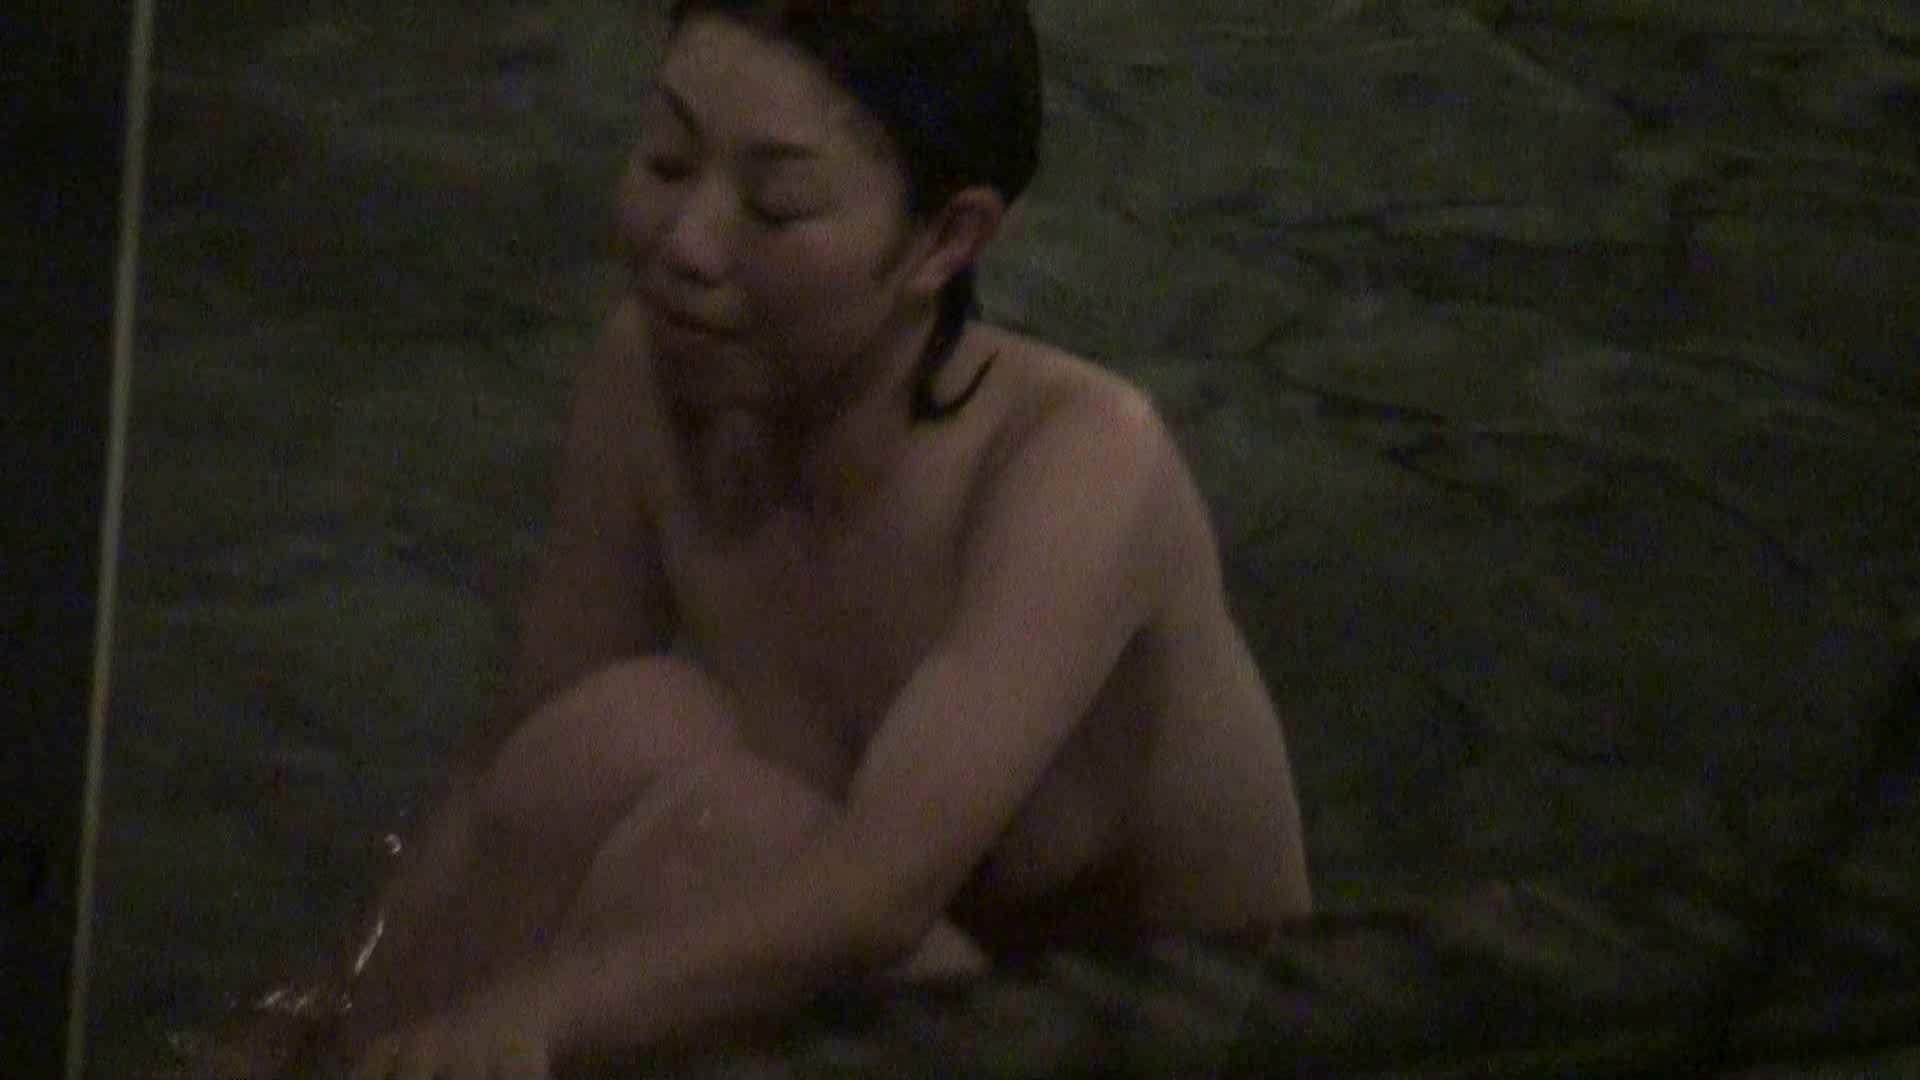 Aquaな露天風呂Vol.330 0   0  57連発 57